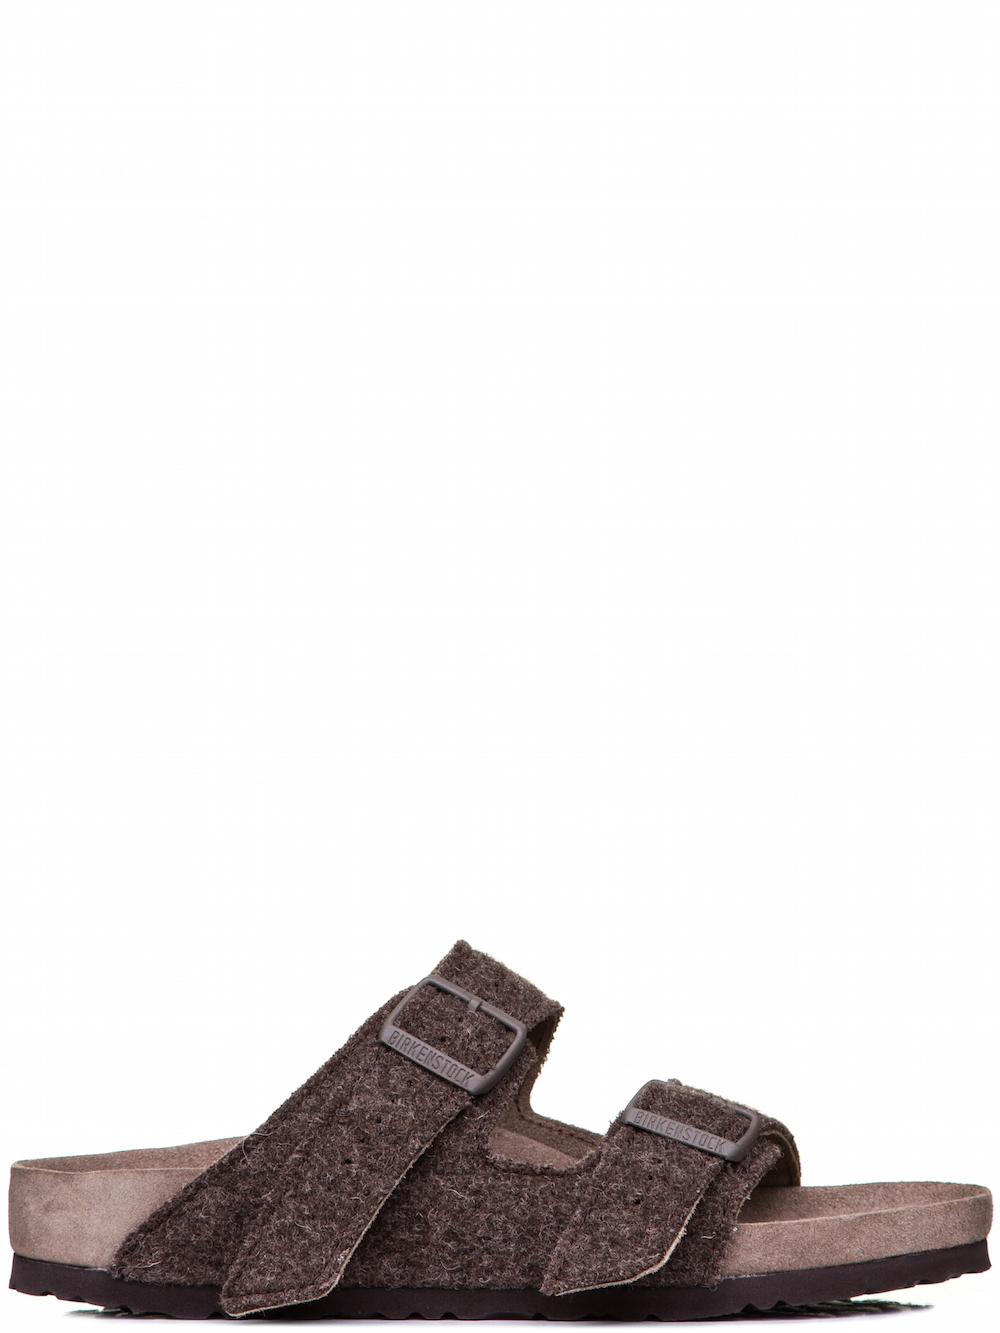 Arizona sandals - Brown Rick Owens nSQ6ECHV